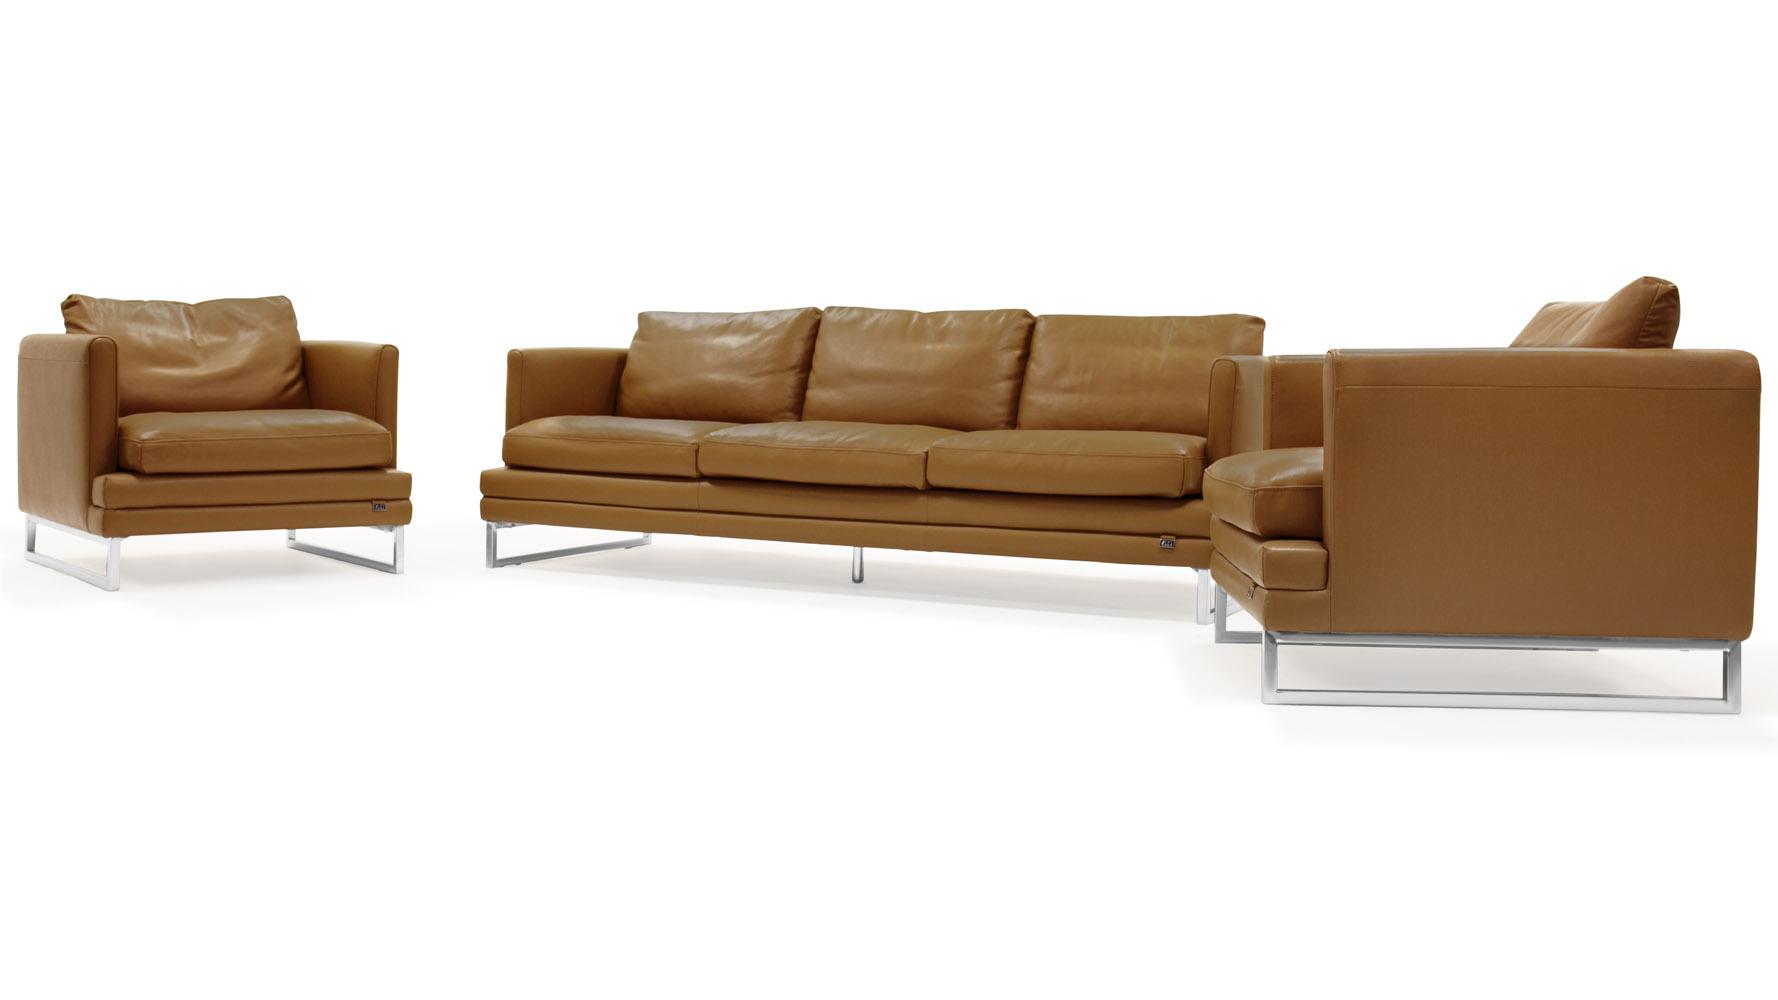 Brando Sofa Set with 2 Armchairs | Zuri Furniture